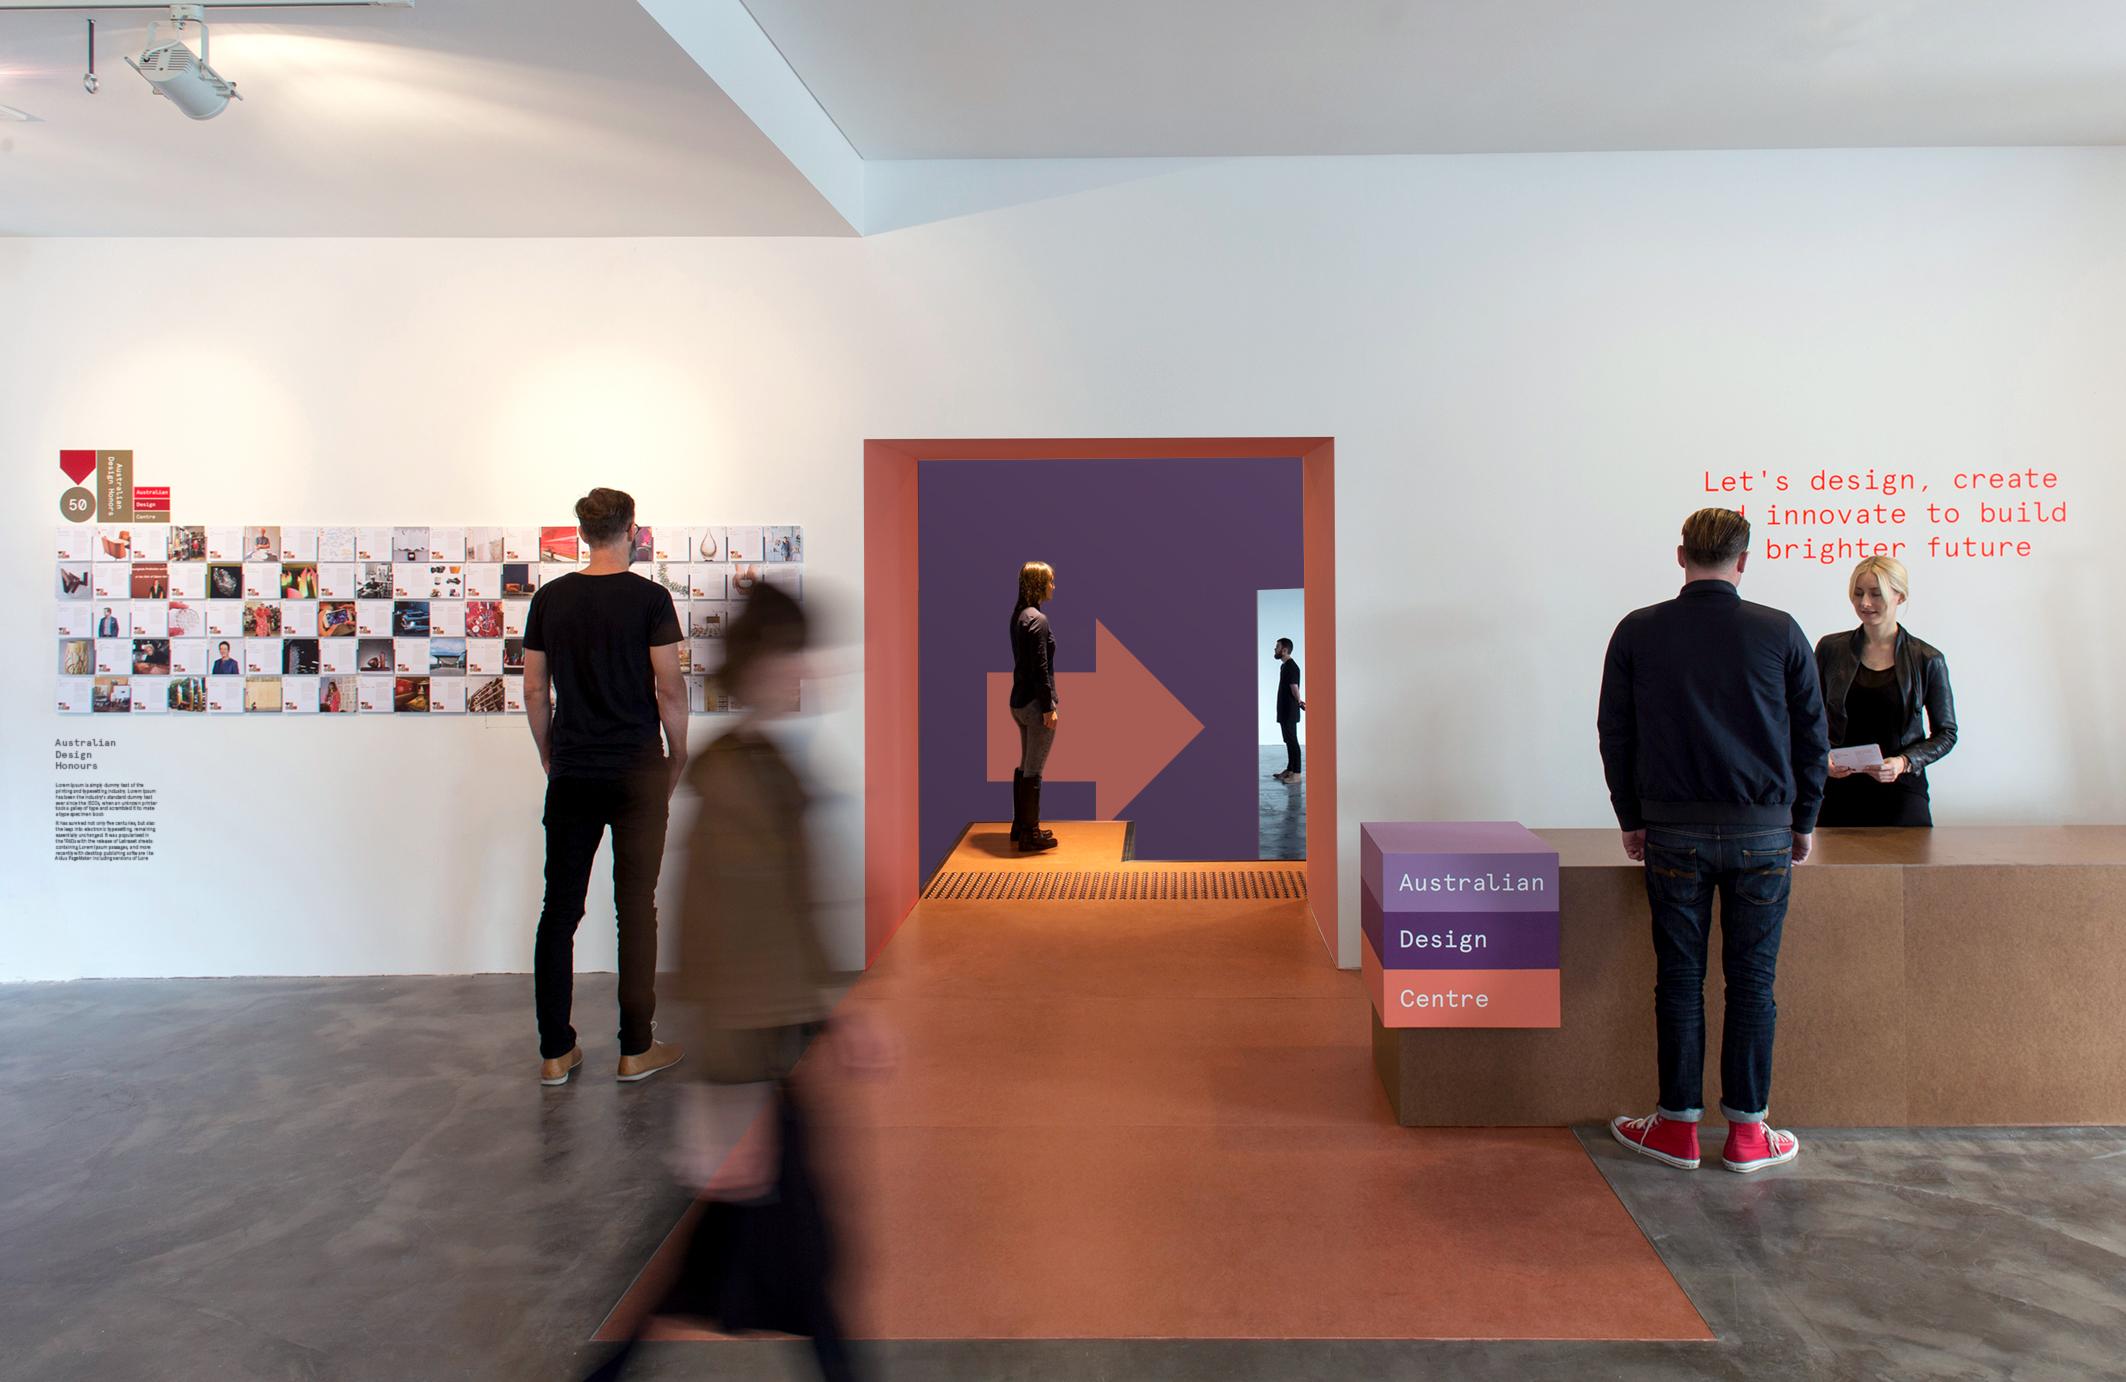 250515--Australian_Design_Centre--Media_Photography--Photo_Credit_Brett_Boardman--6315_sml_RT_RC.jpg